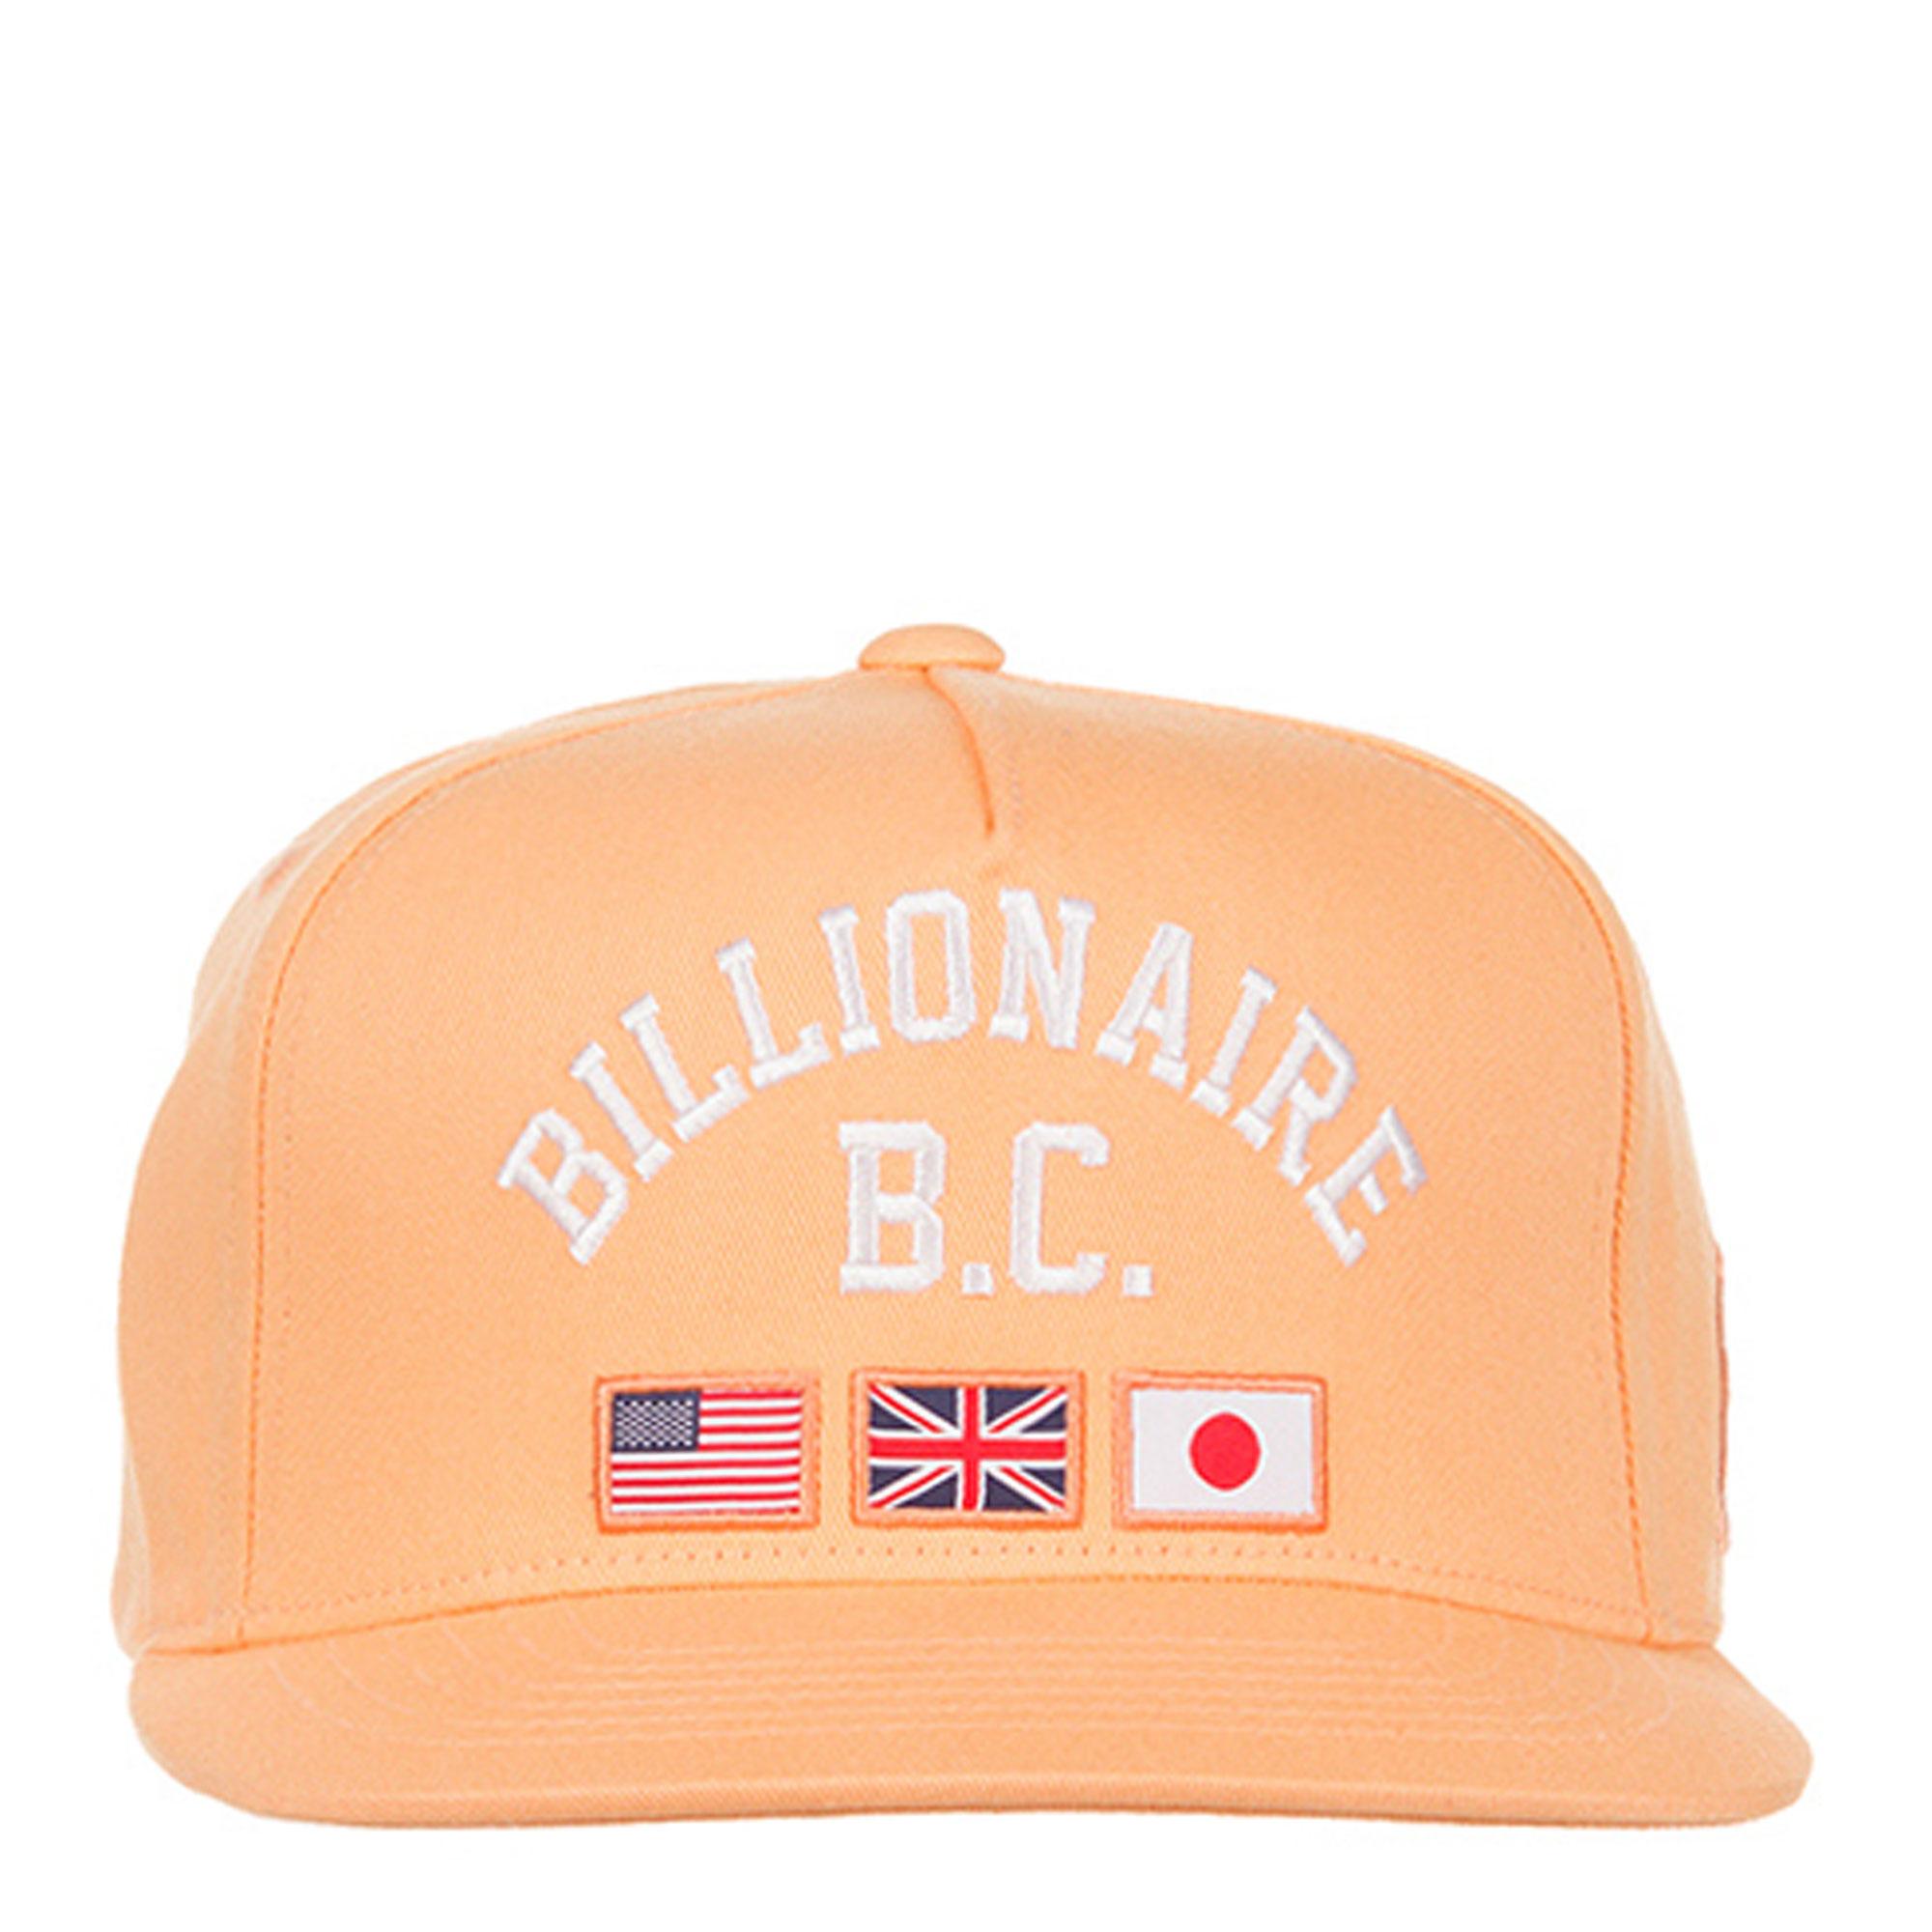 snapback hat in peach cobbler